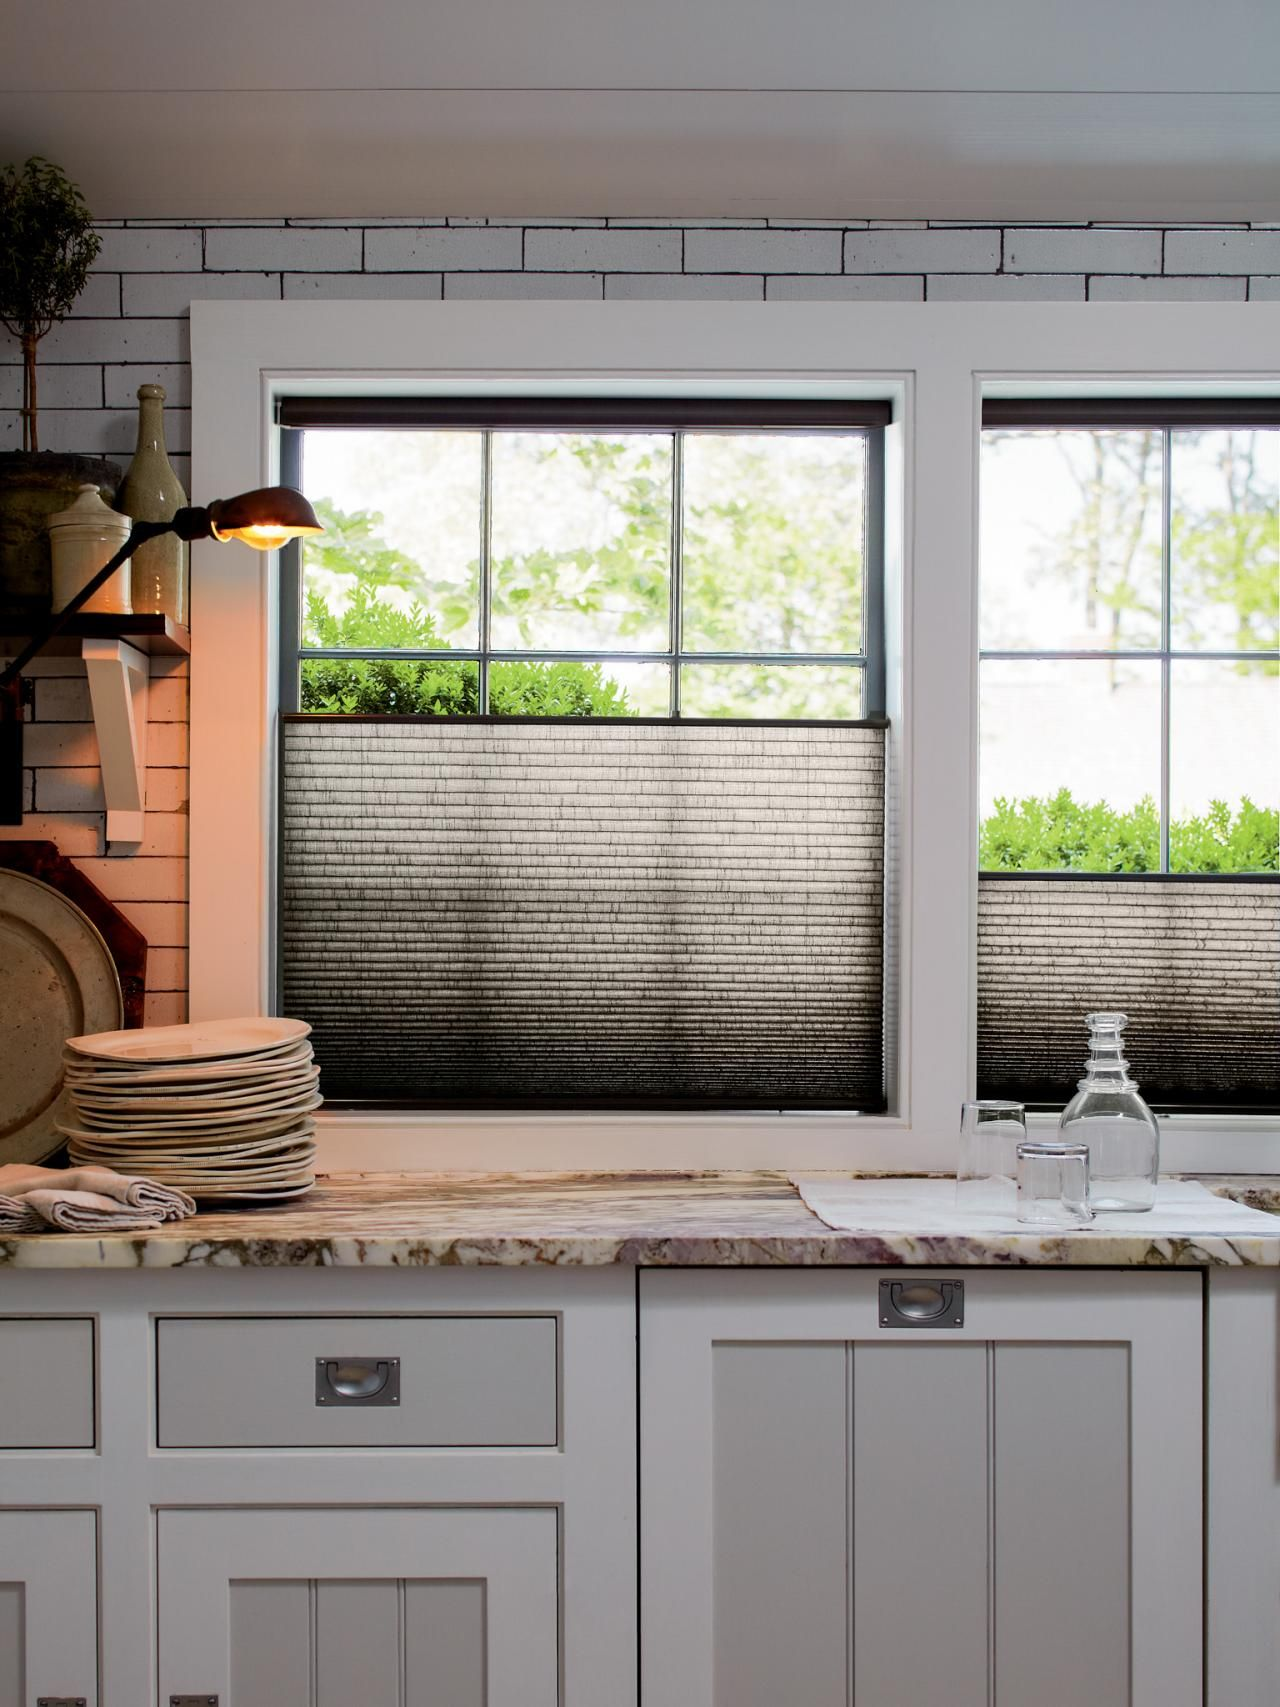 10 Stylish Kitchen Window Treatment Ideas | Hgtv, Window and Kitchens